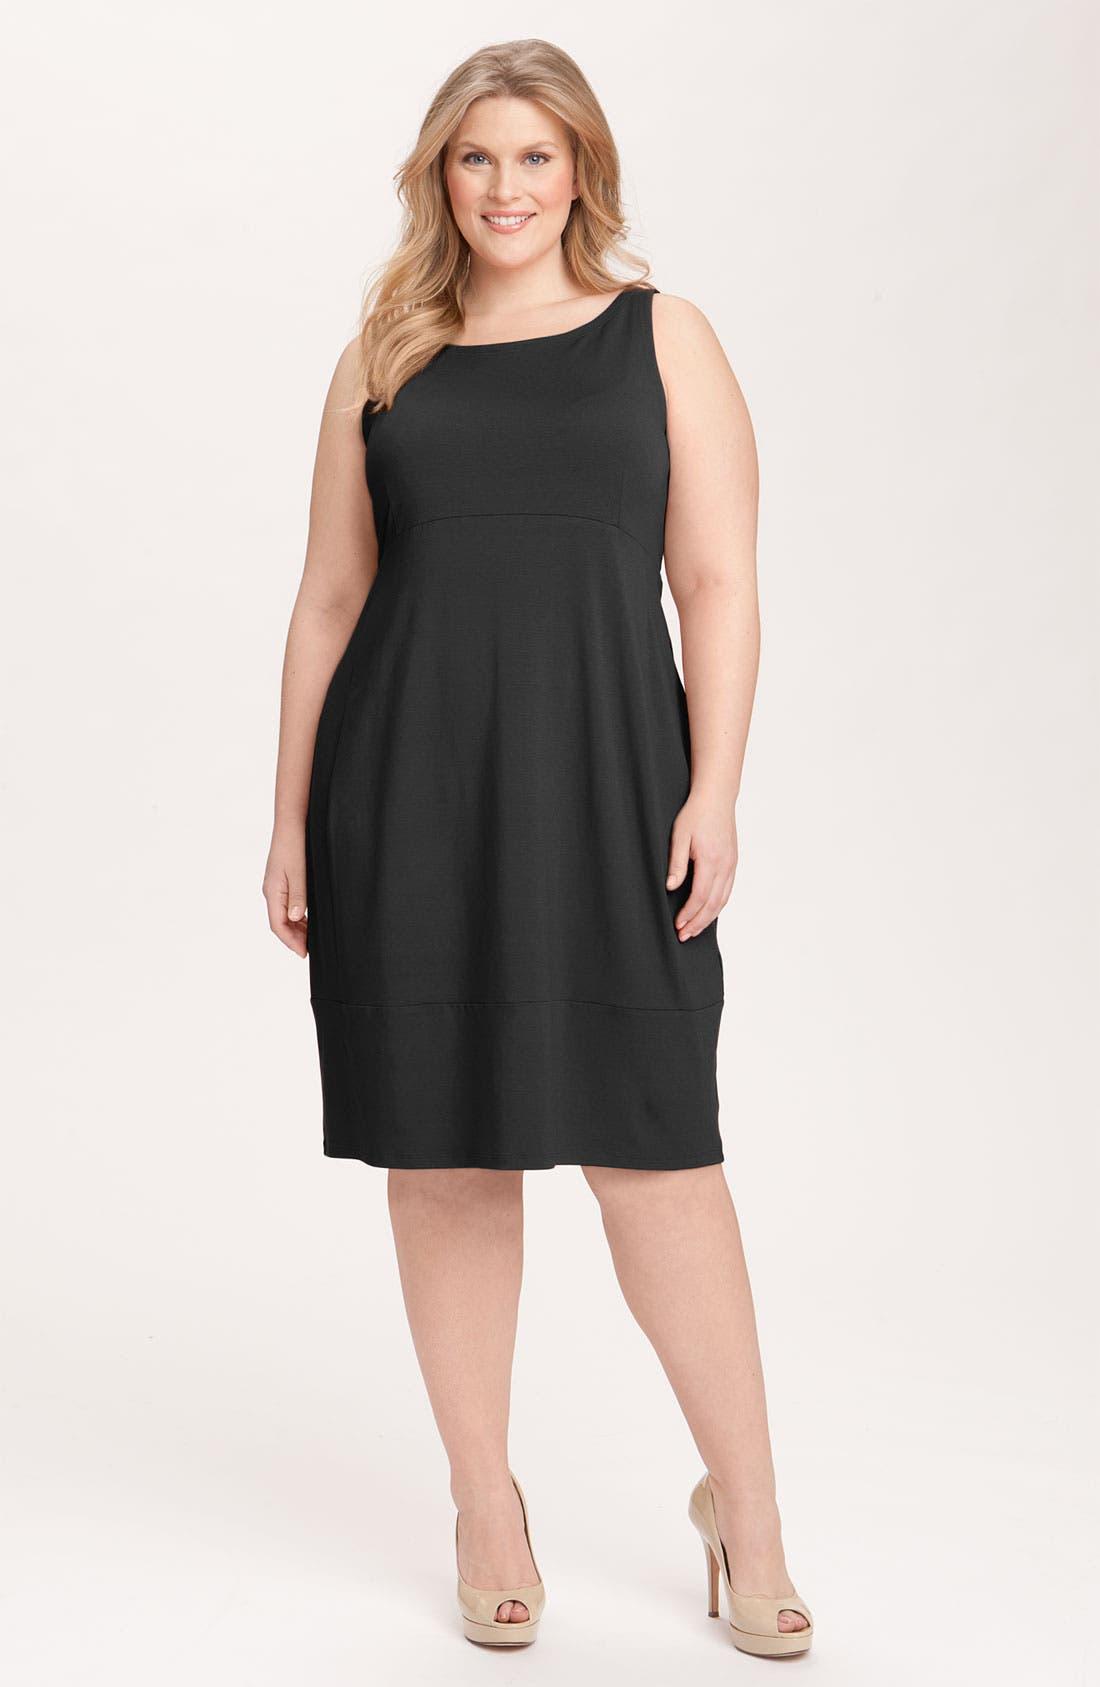 Alternate Image 1 Selected - Eileen Fisher Cutout Back Sleeveless Dress (Plus)